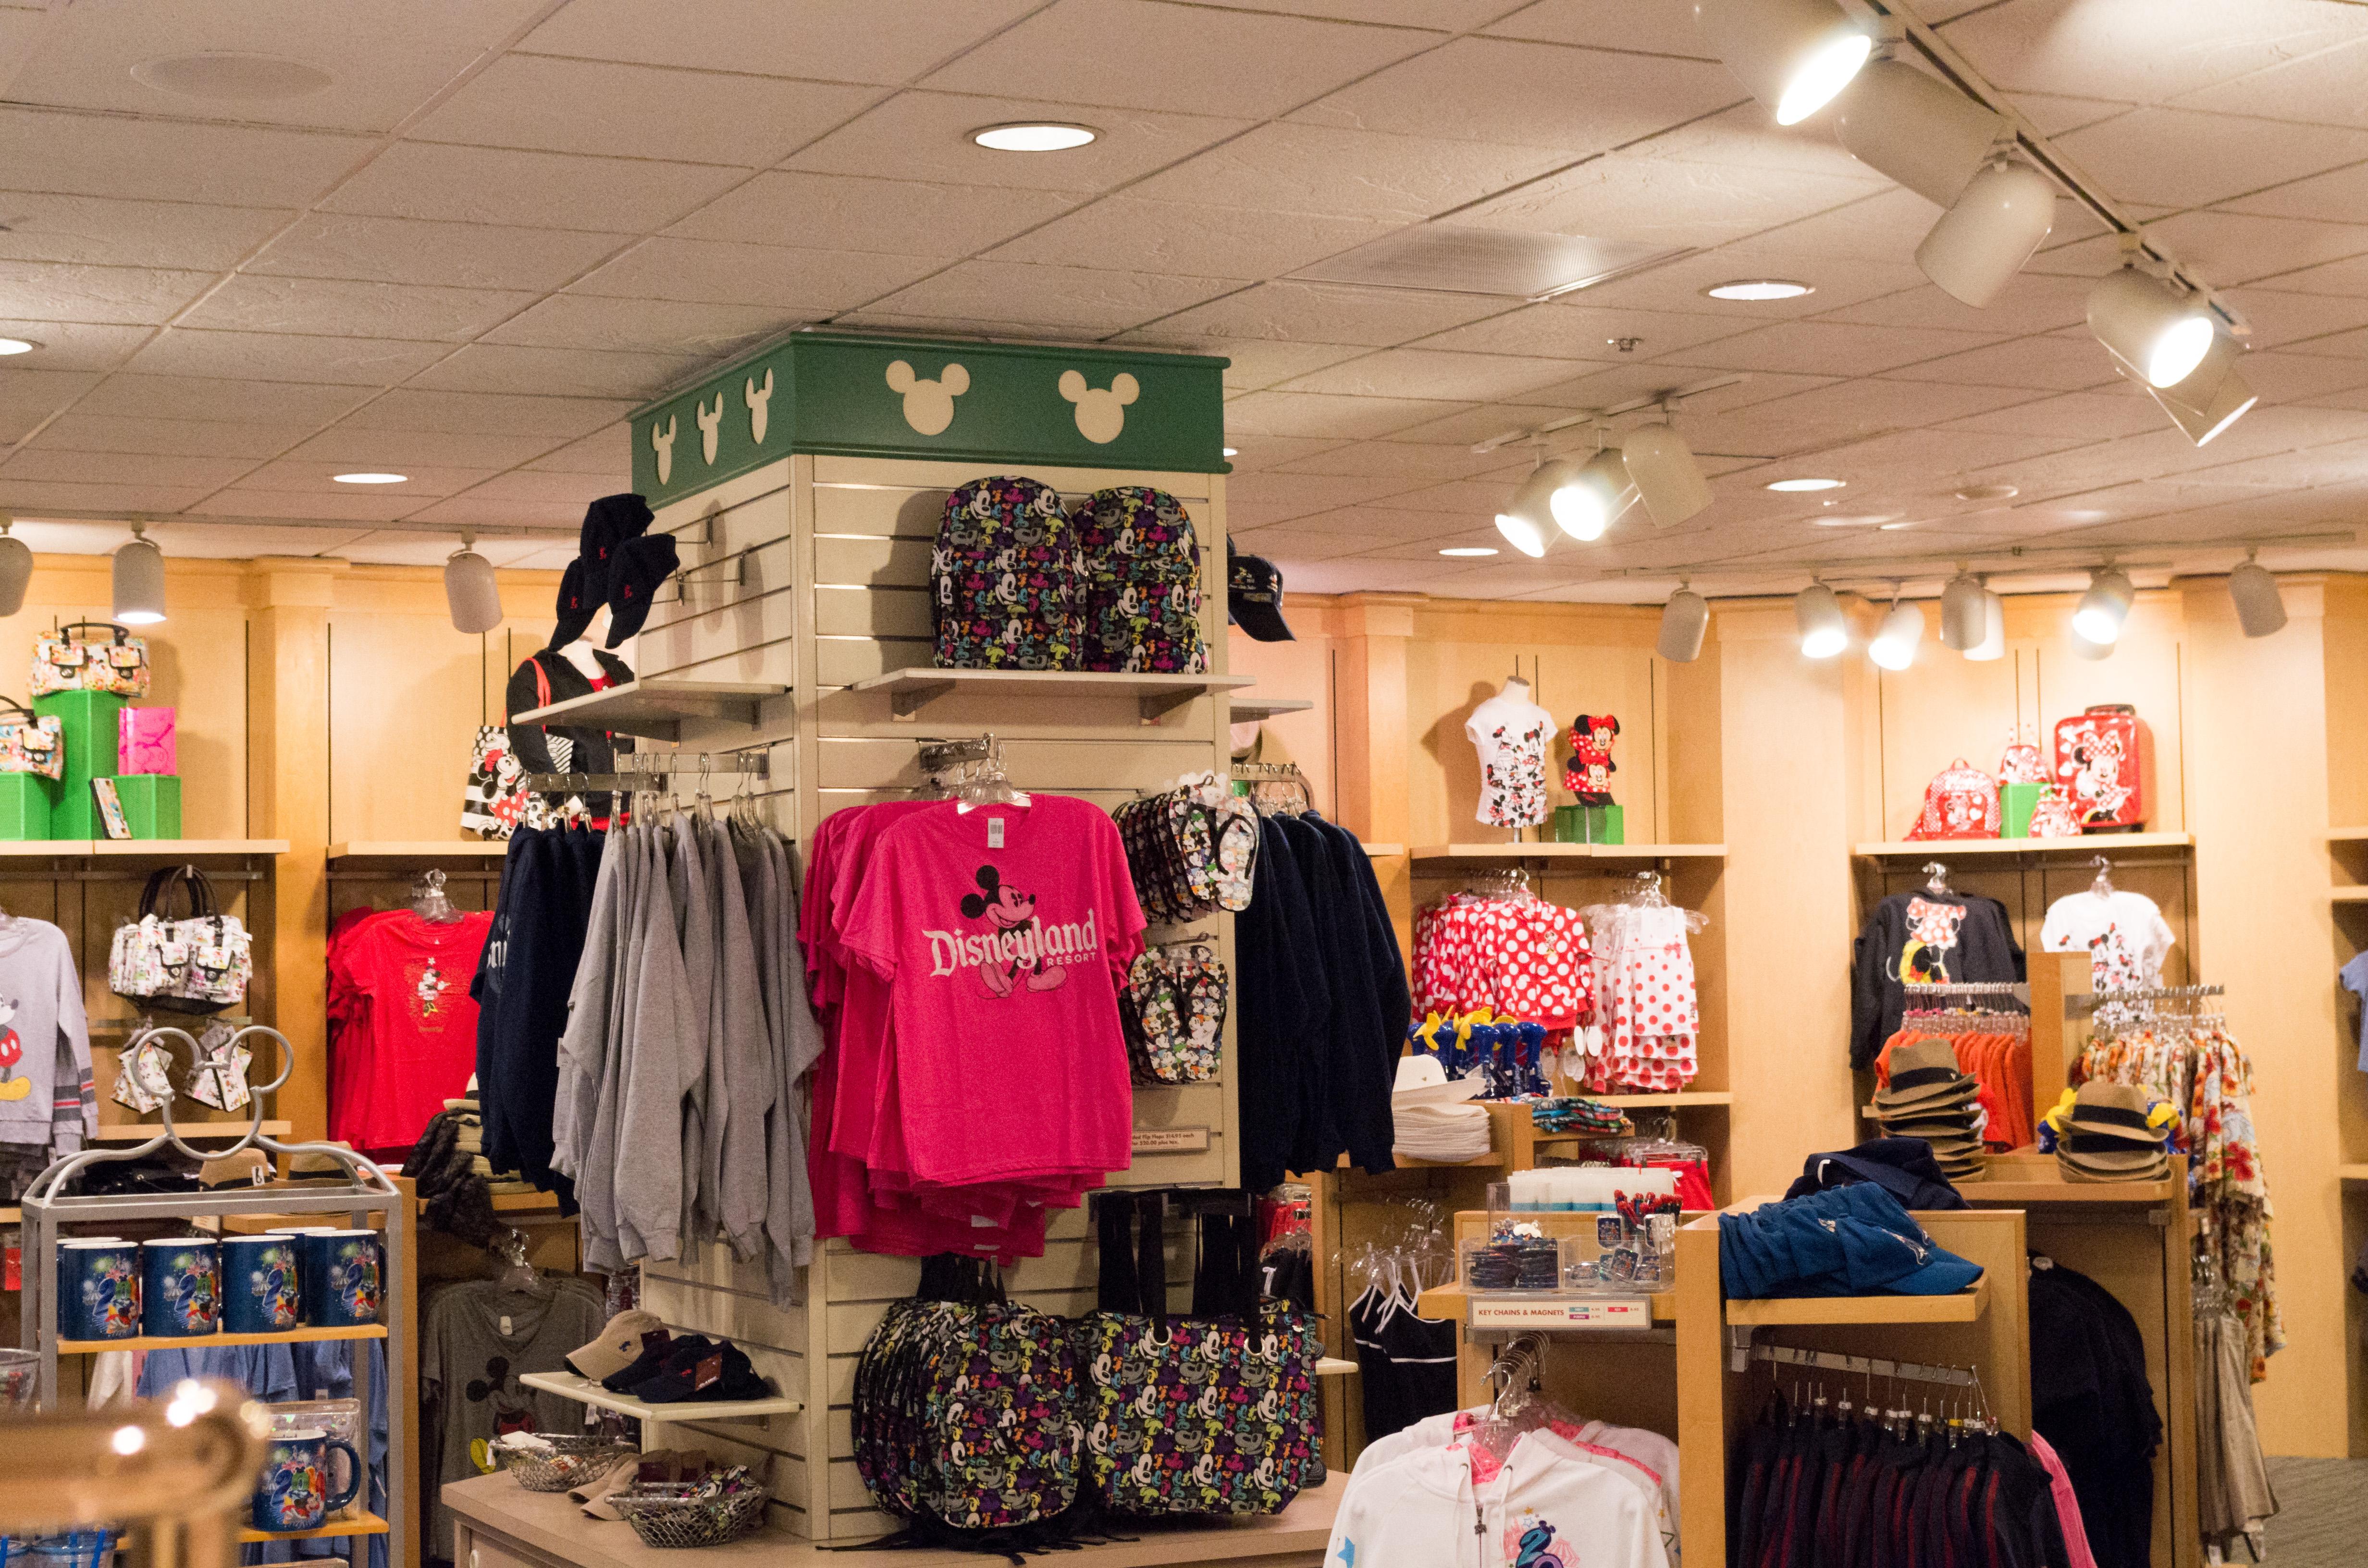 File:Gift Shop, Paradise Pier Hotel 2014.jpg - Wikimedia Commons